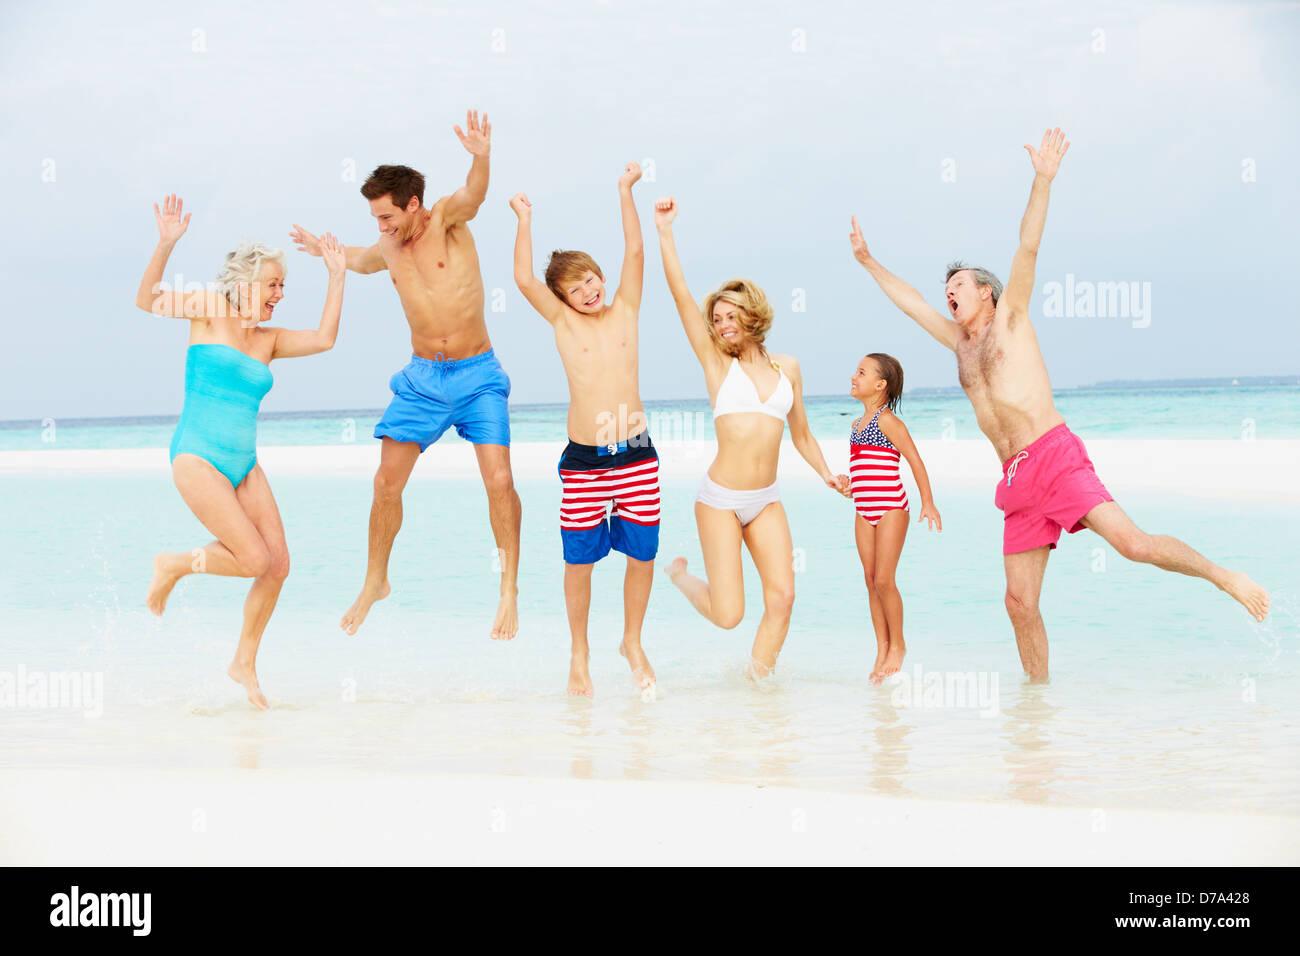 Multi Generation Family Having Fun In Sea On Beach Holiday Stock Photo